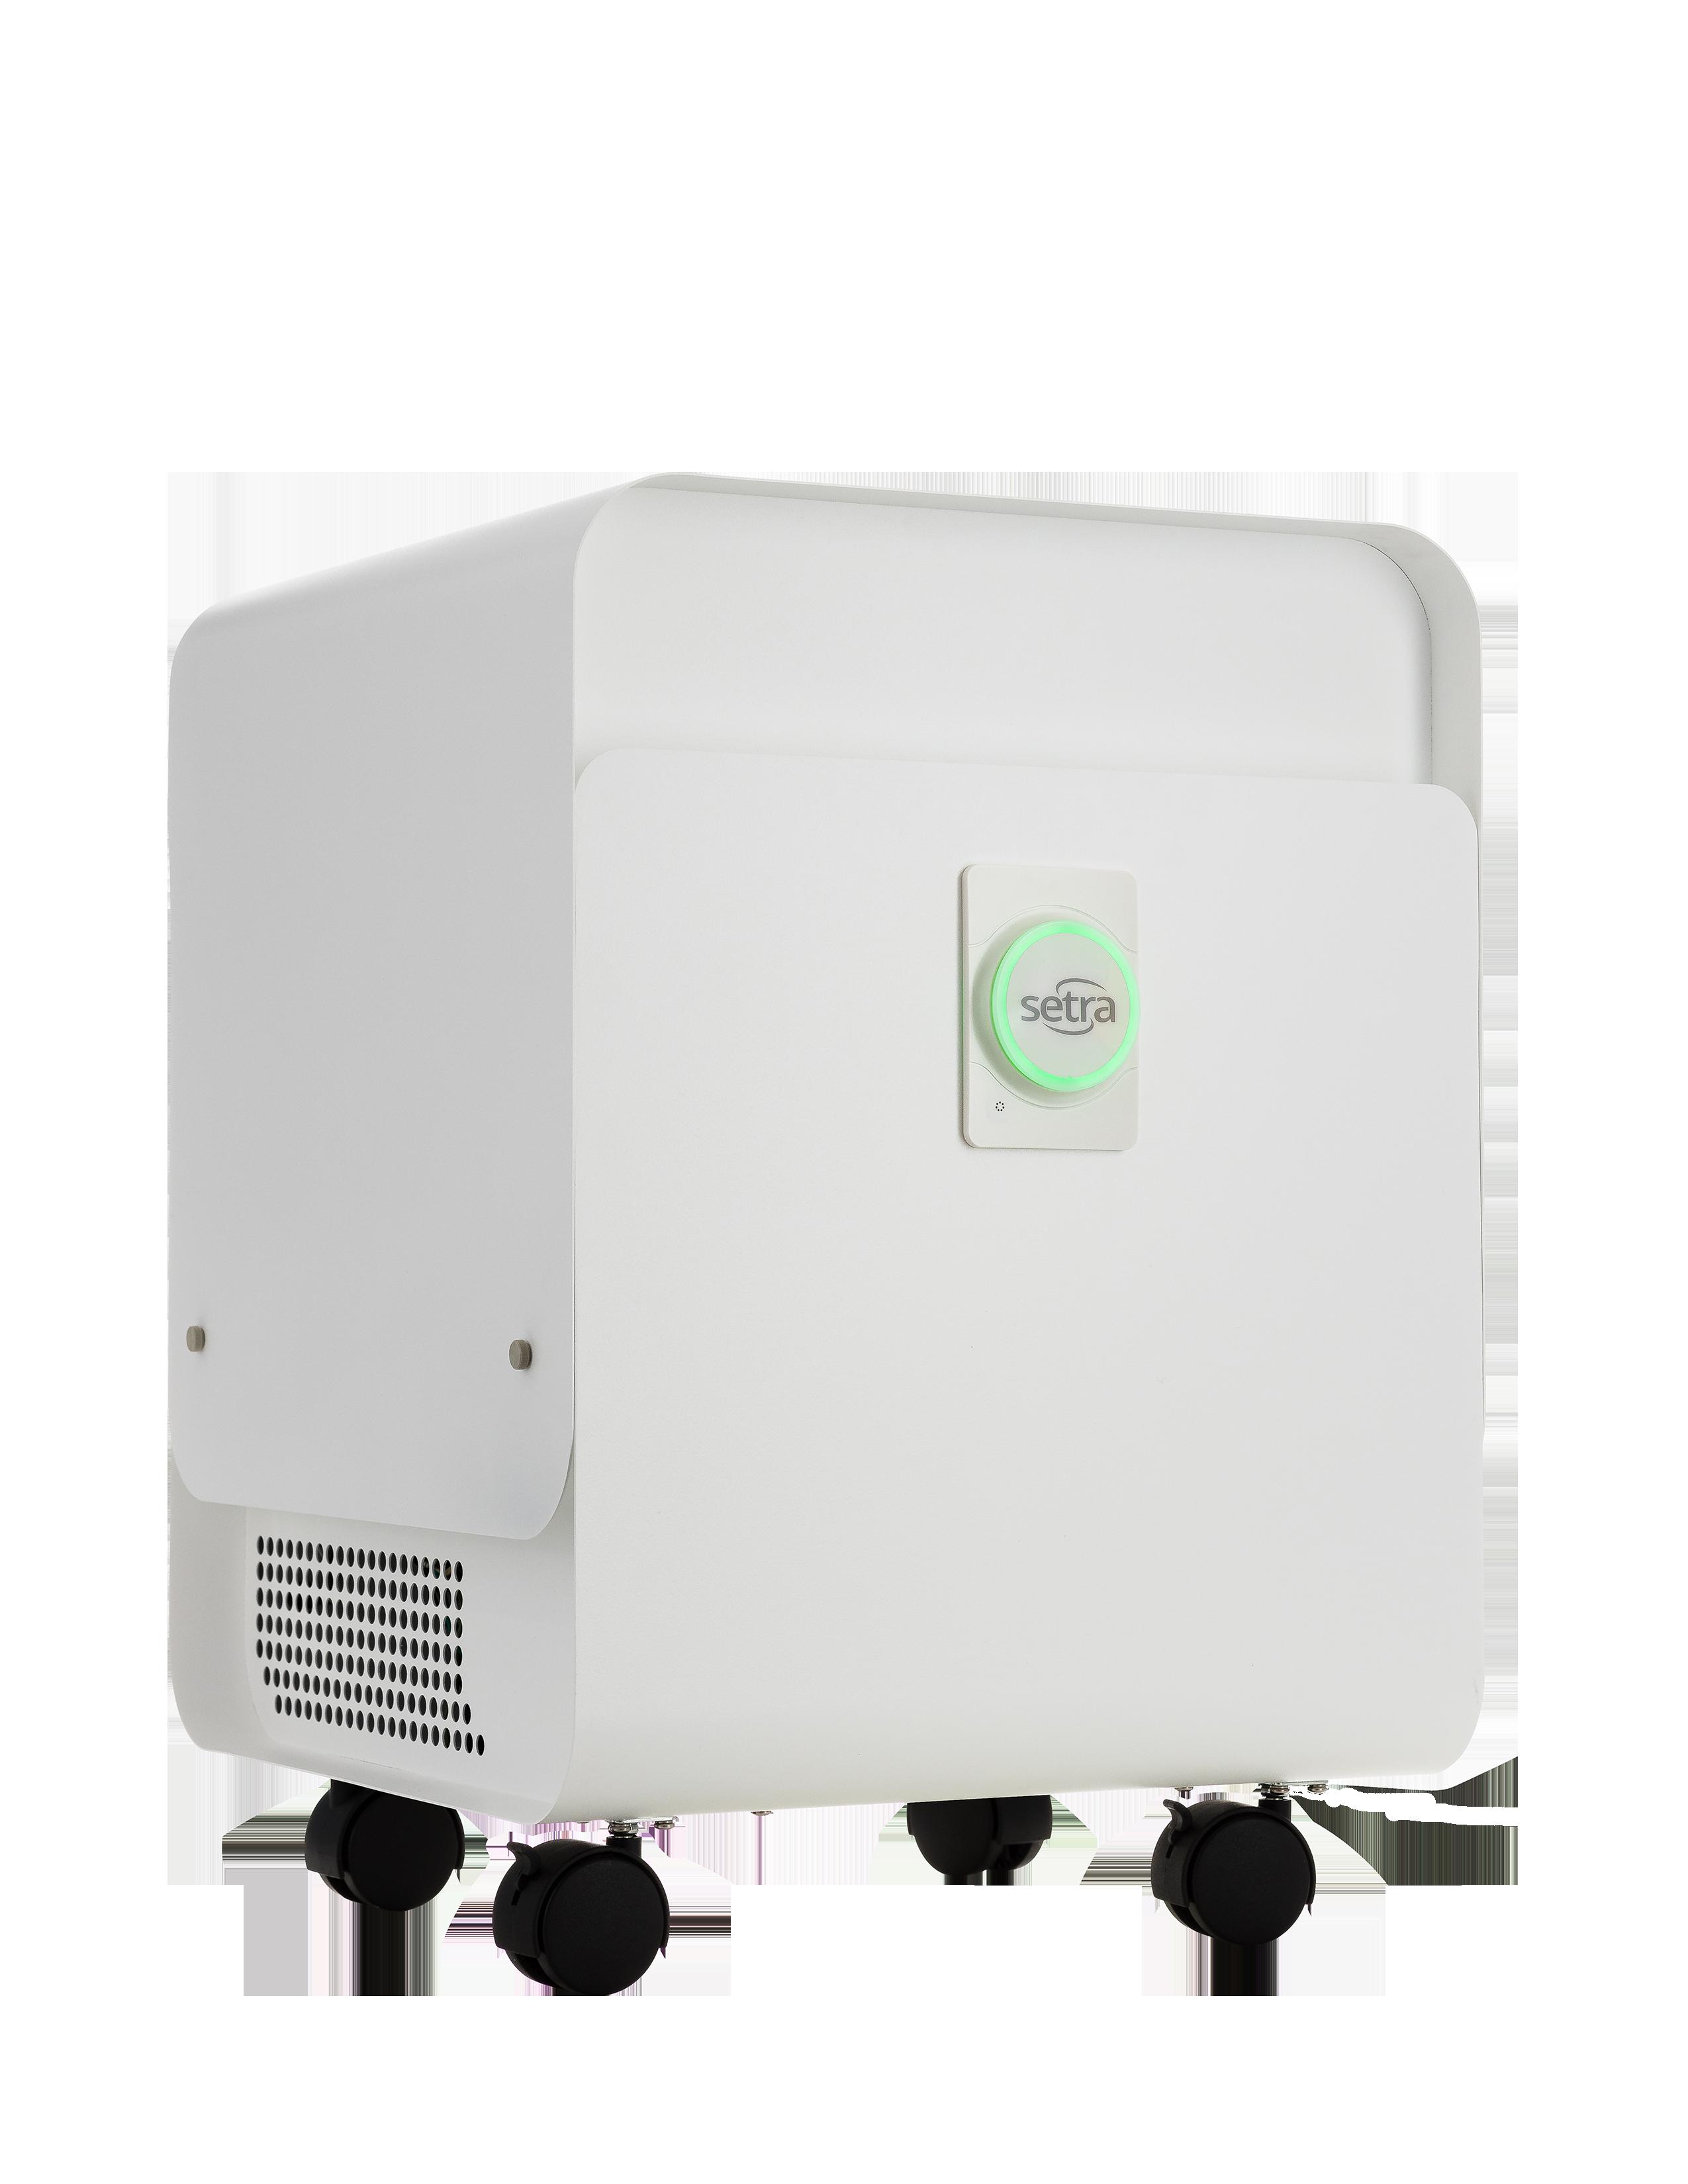 aiir-watch-uv-hepa-air-purifier